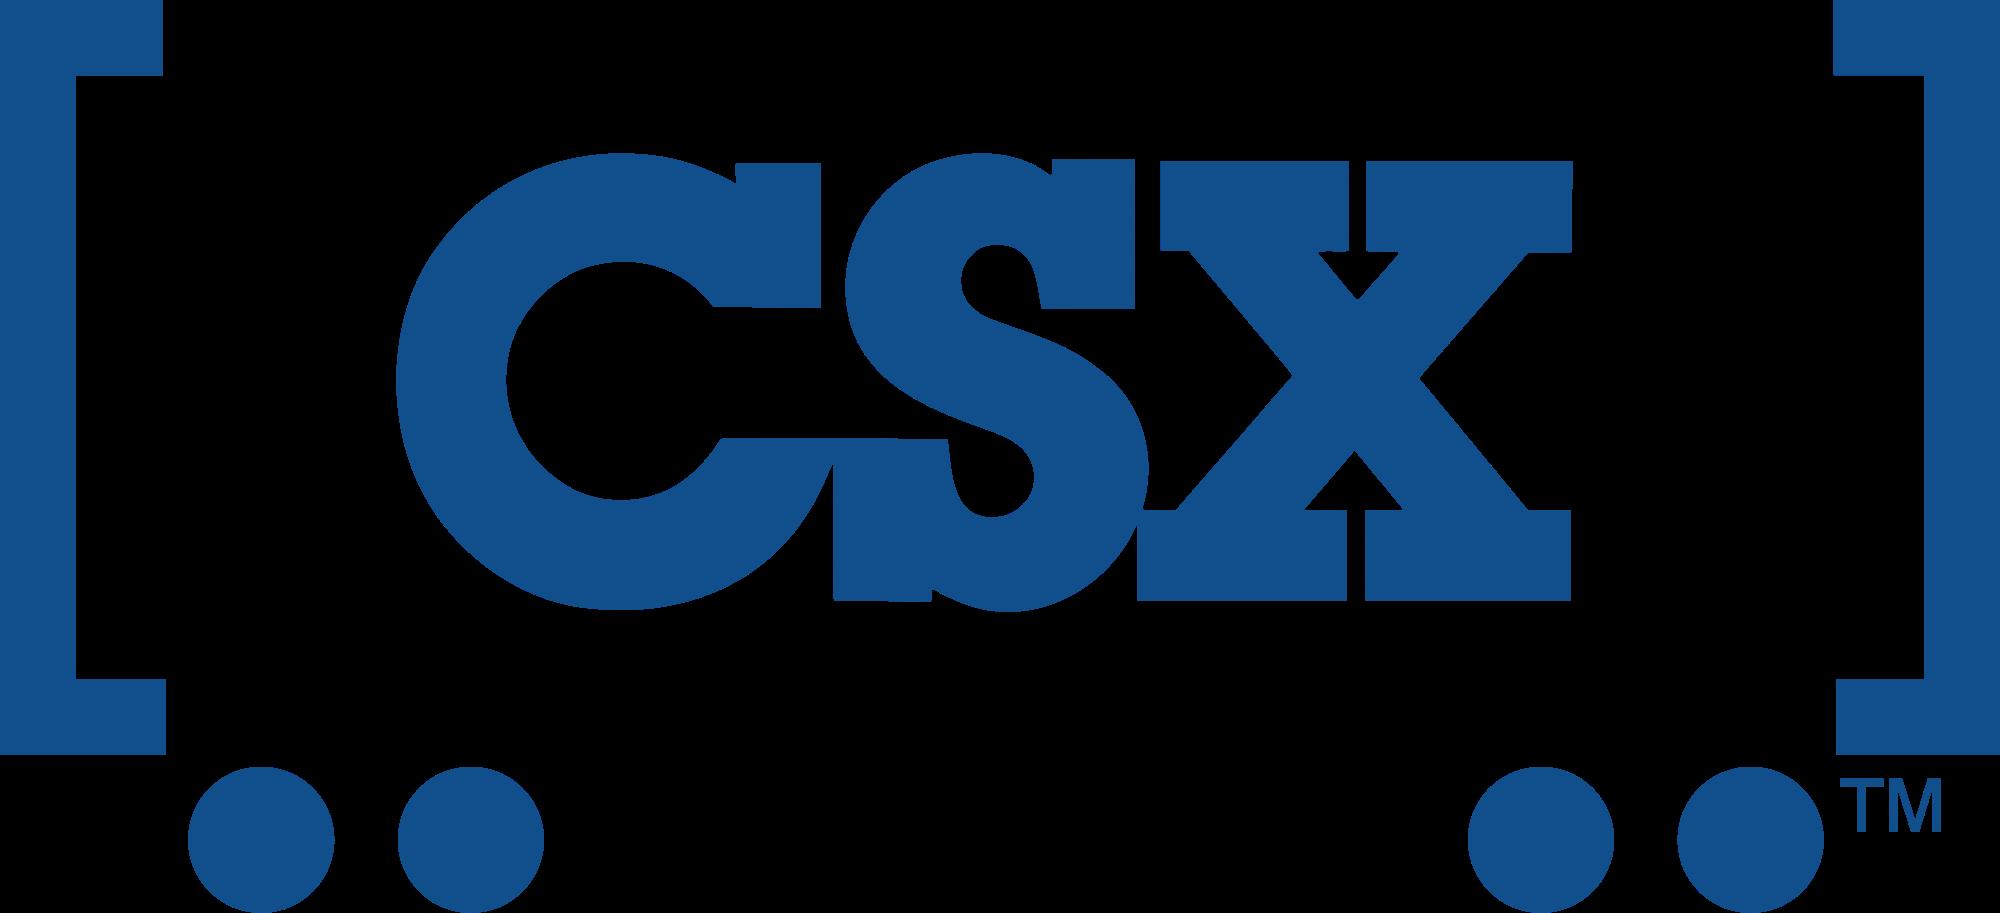 CSX_transp_logo.svg